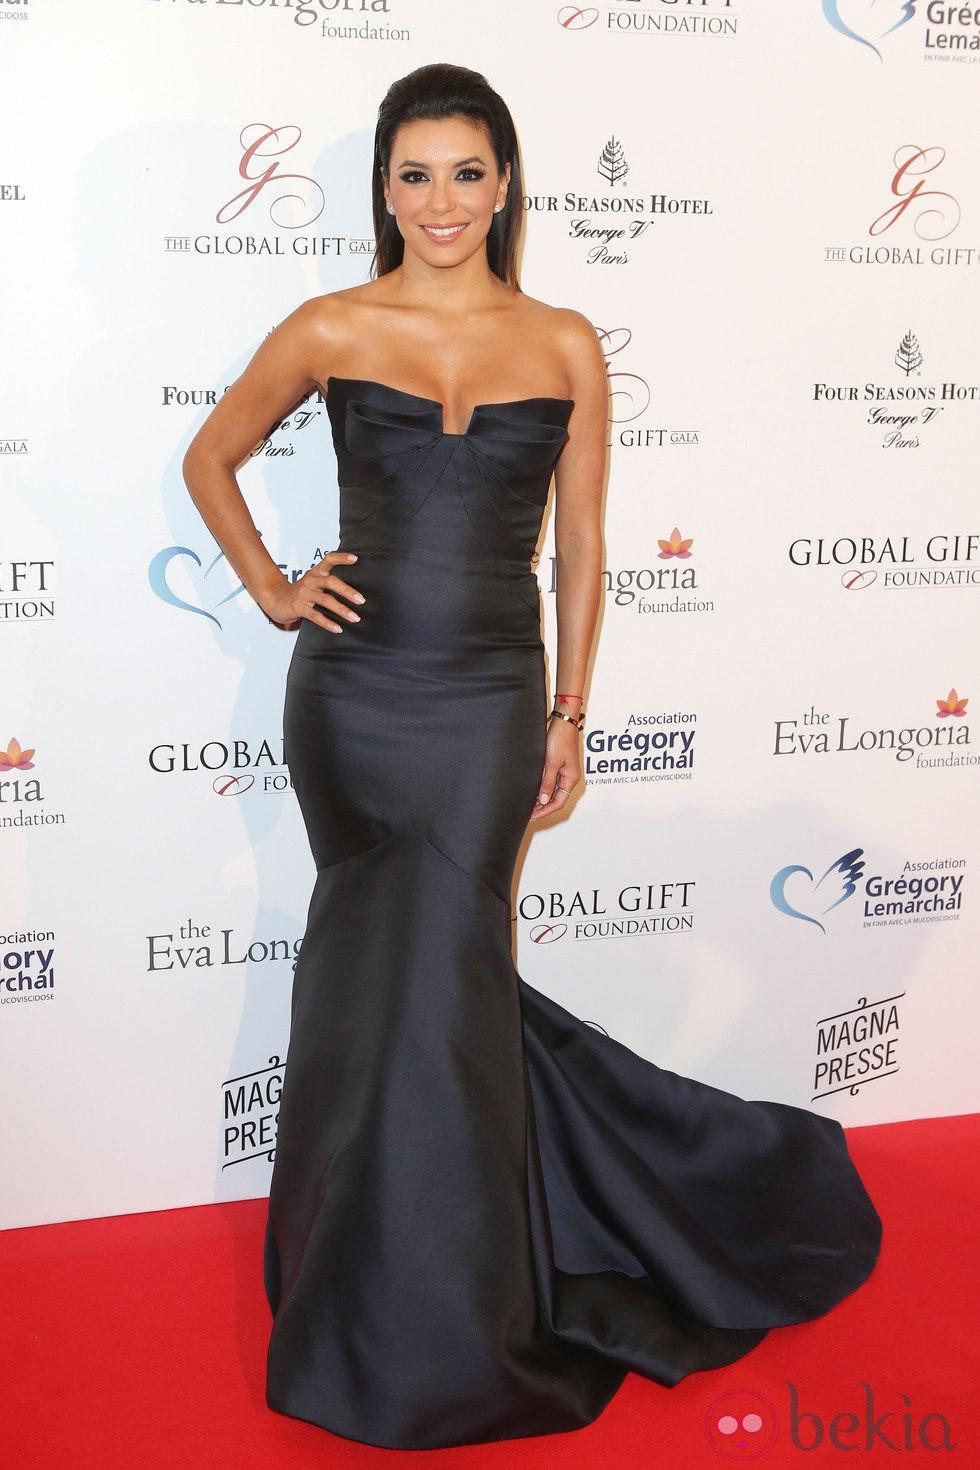 Eva Longoria con un Monique Lhuillier azul marino en la Global Gift Gala 2014 de París